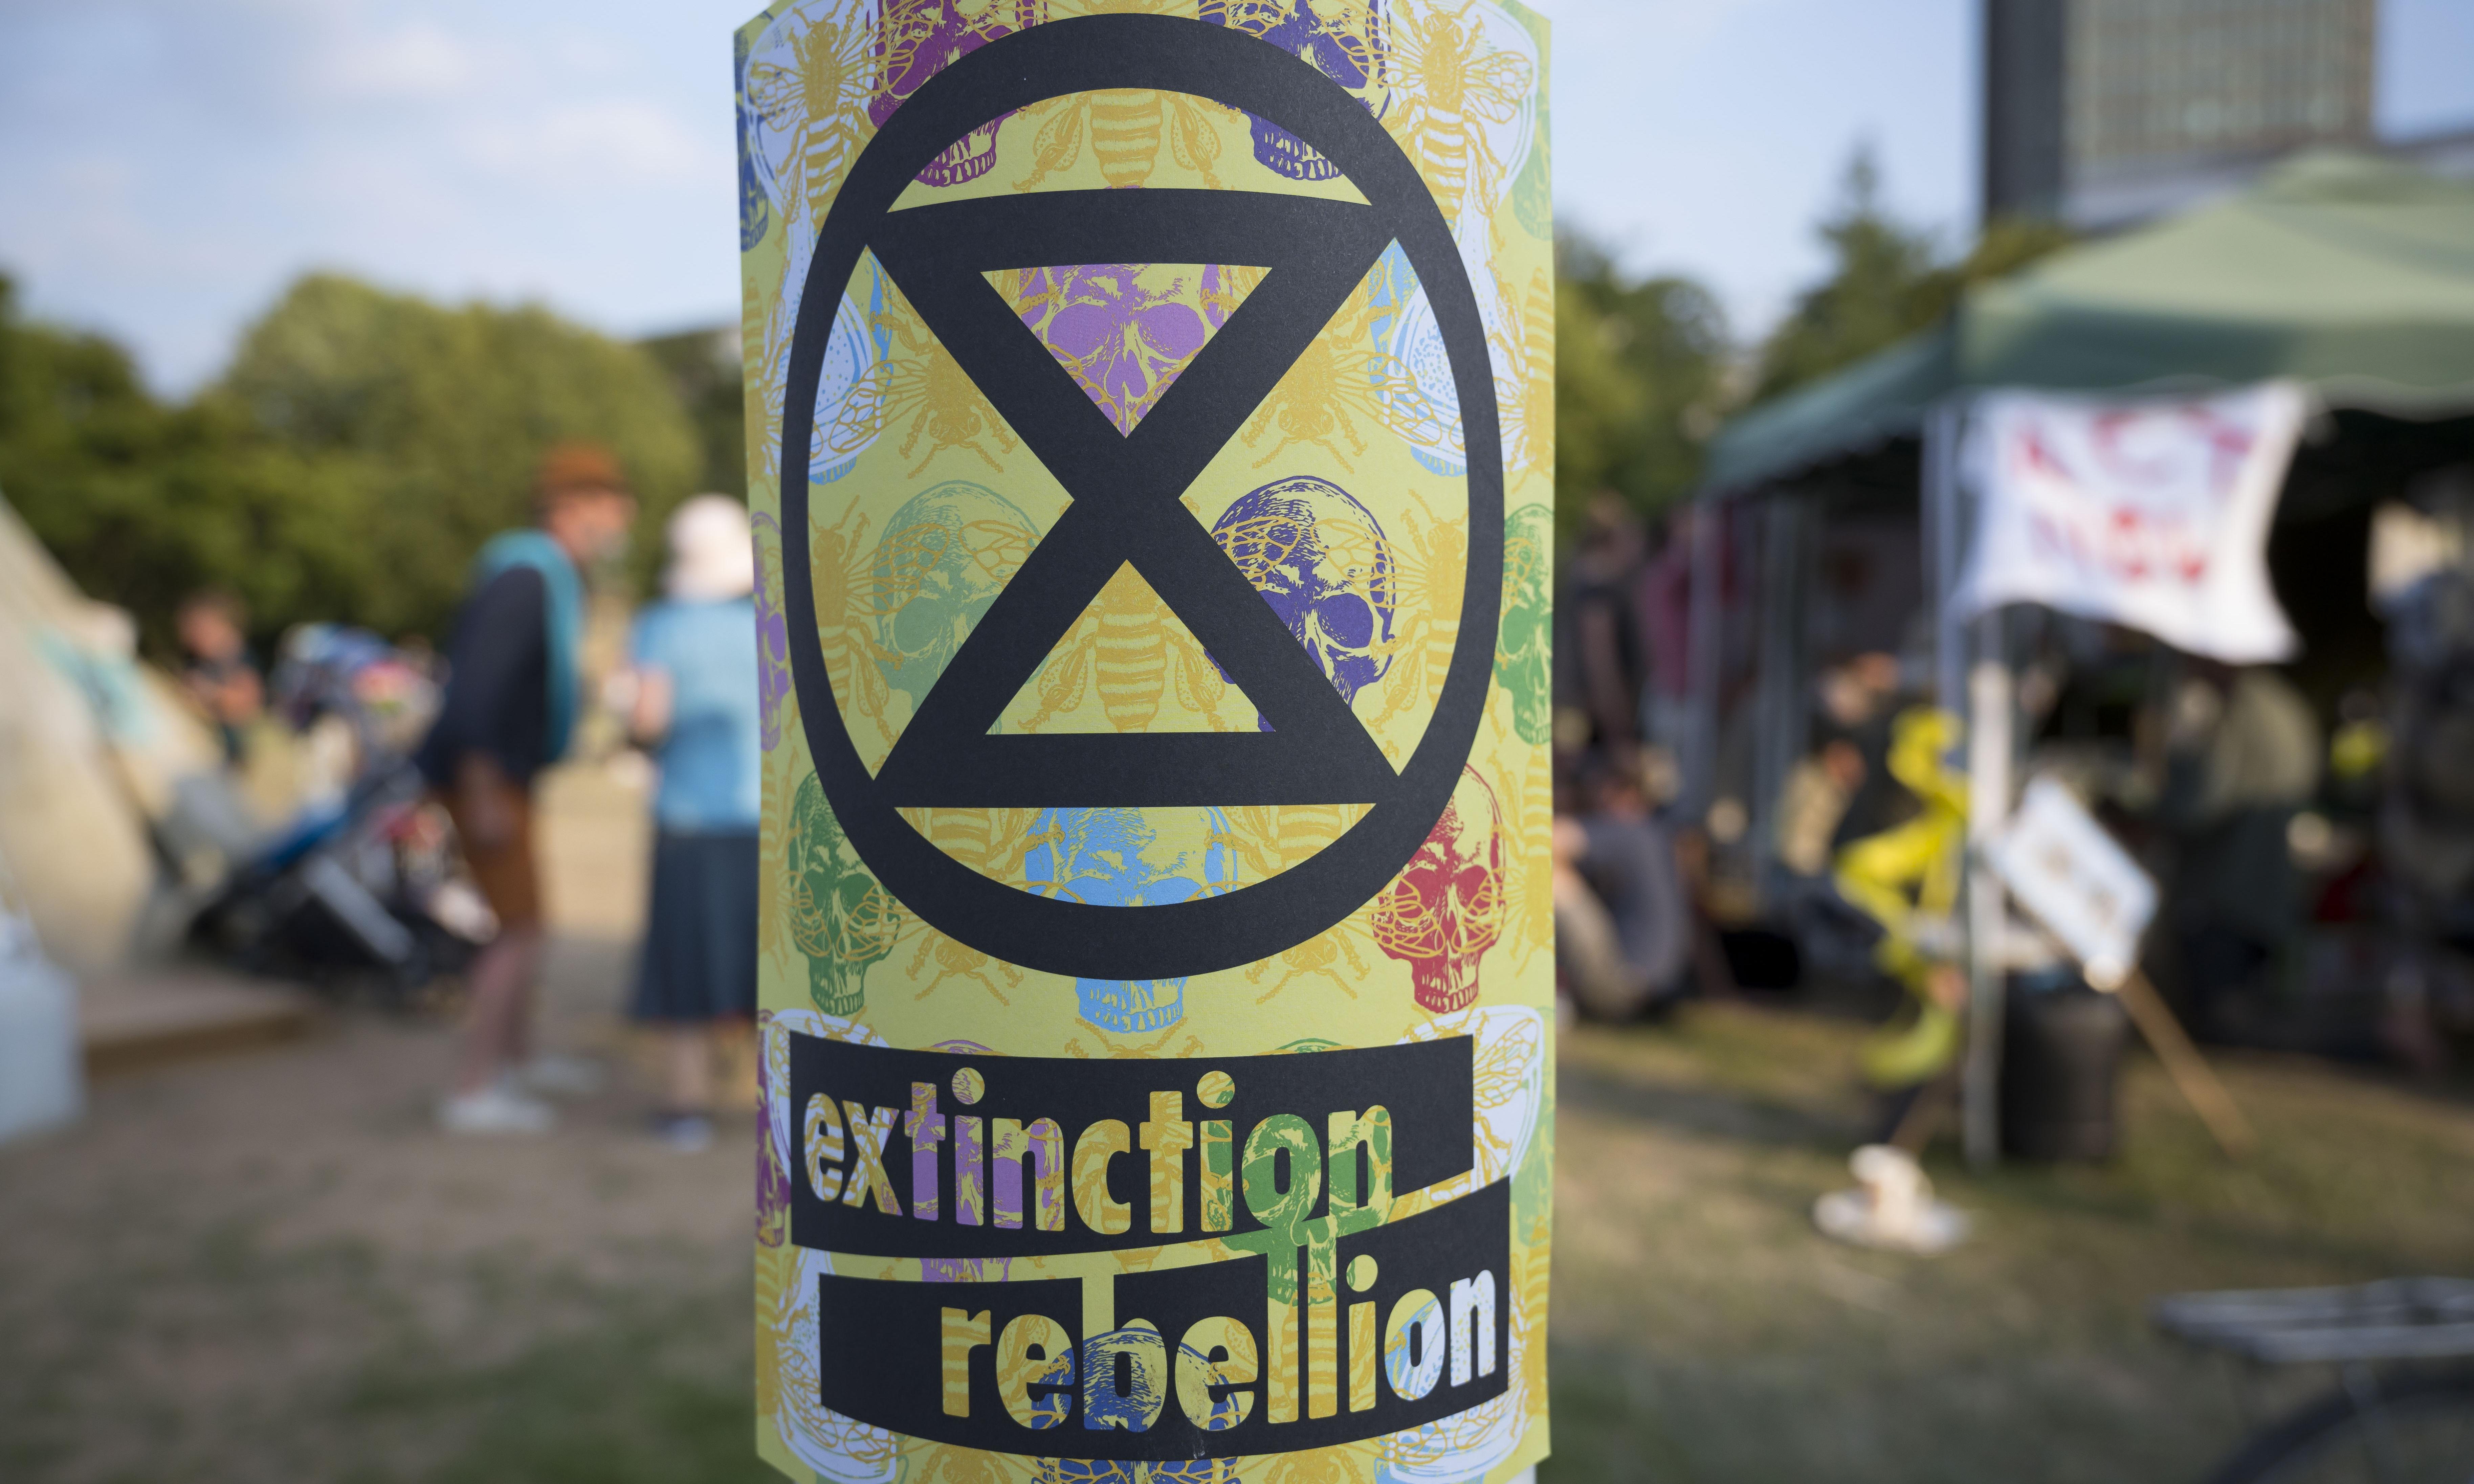 Extinction Rebellion protesters arrested in Bristol